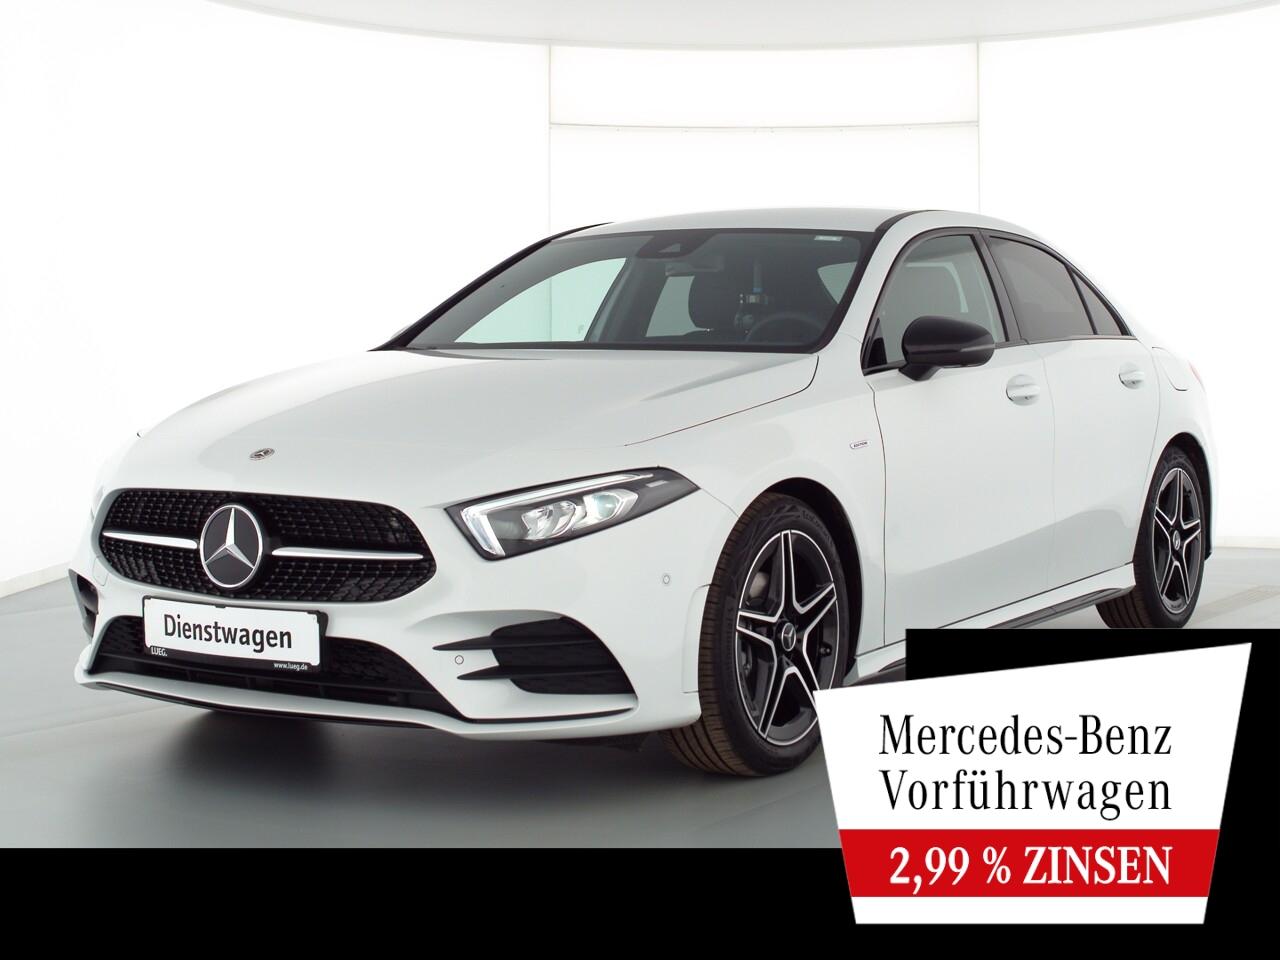 Mercedes-Benz A 180 Lim EDITION2020+AMG+NIGHT+AHK+360°+TOTW., Jahr 2021, Benzin